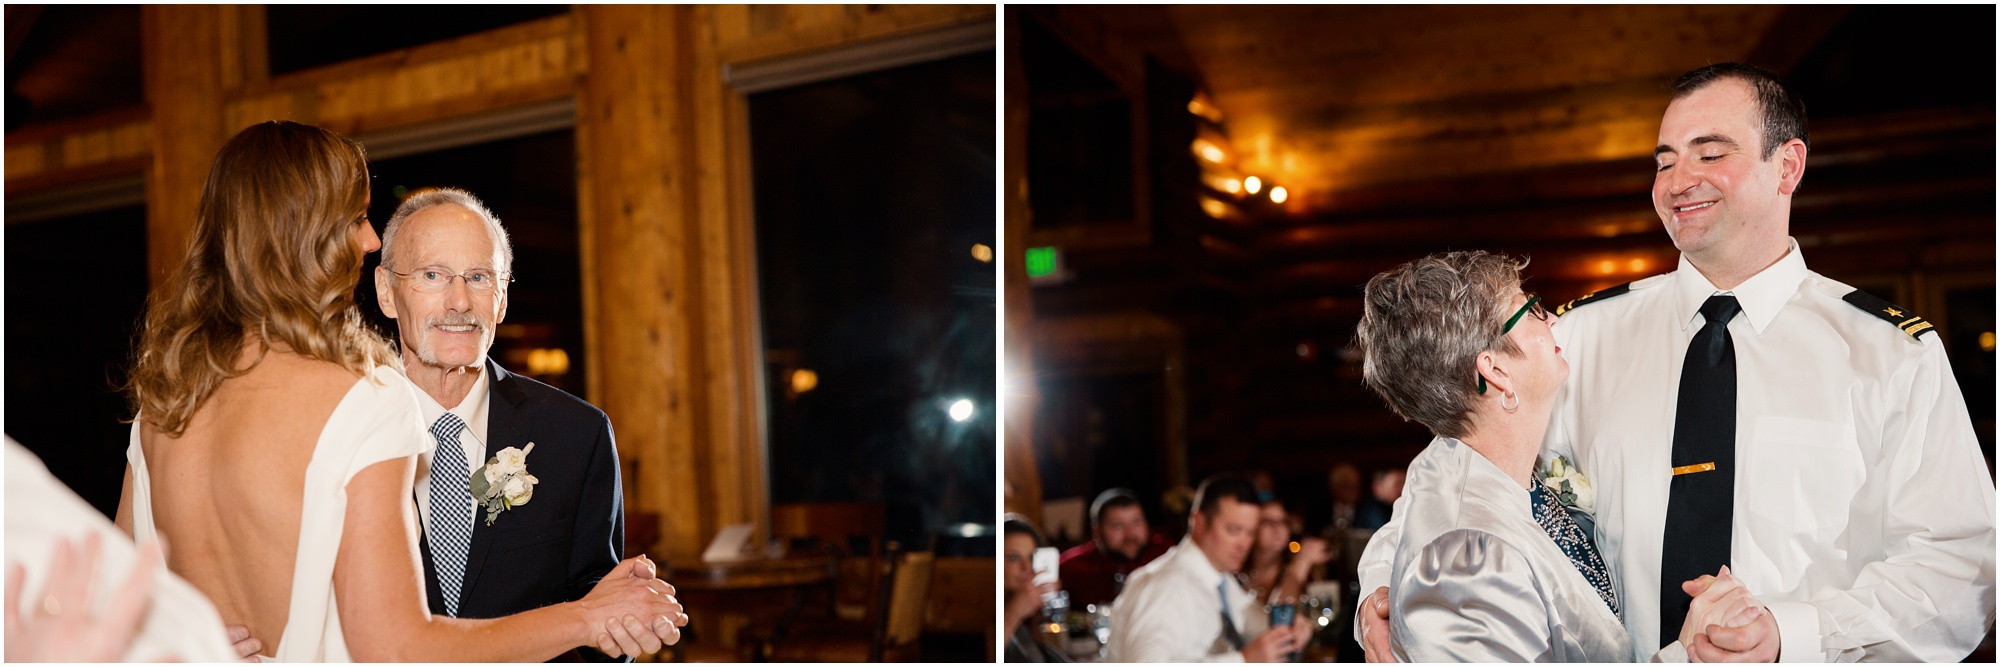 Breckenridge-Wedding-Photographer_0058.jpg